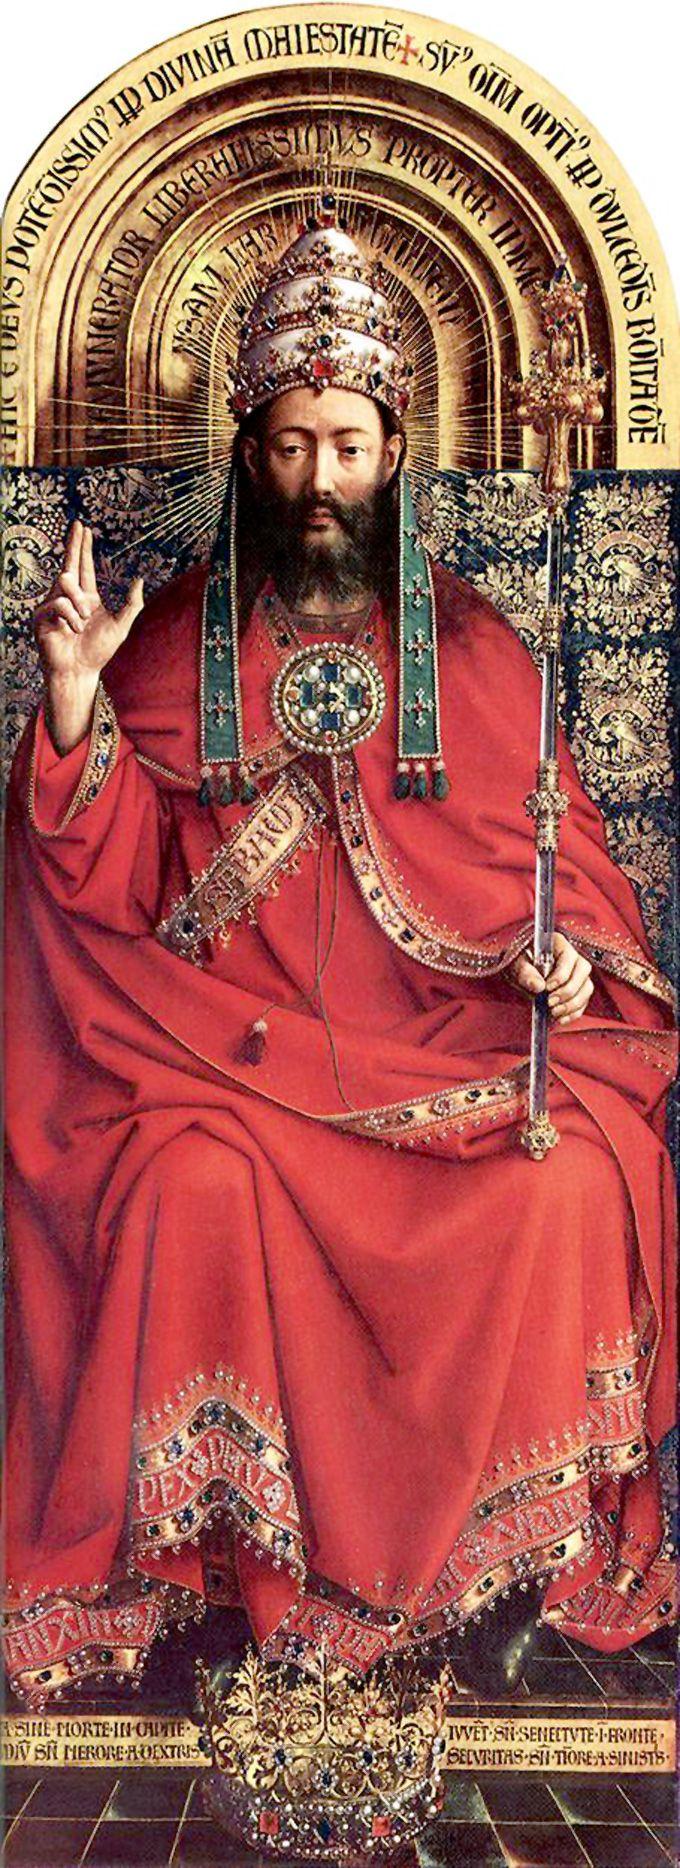 The Ghent Altarpiece: God Almighty by Jan Van Eyck, 1432